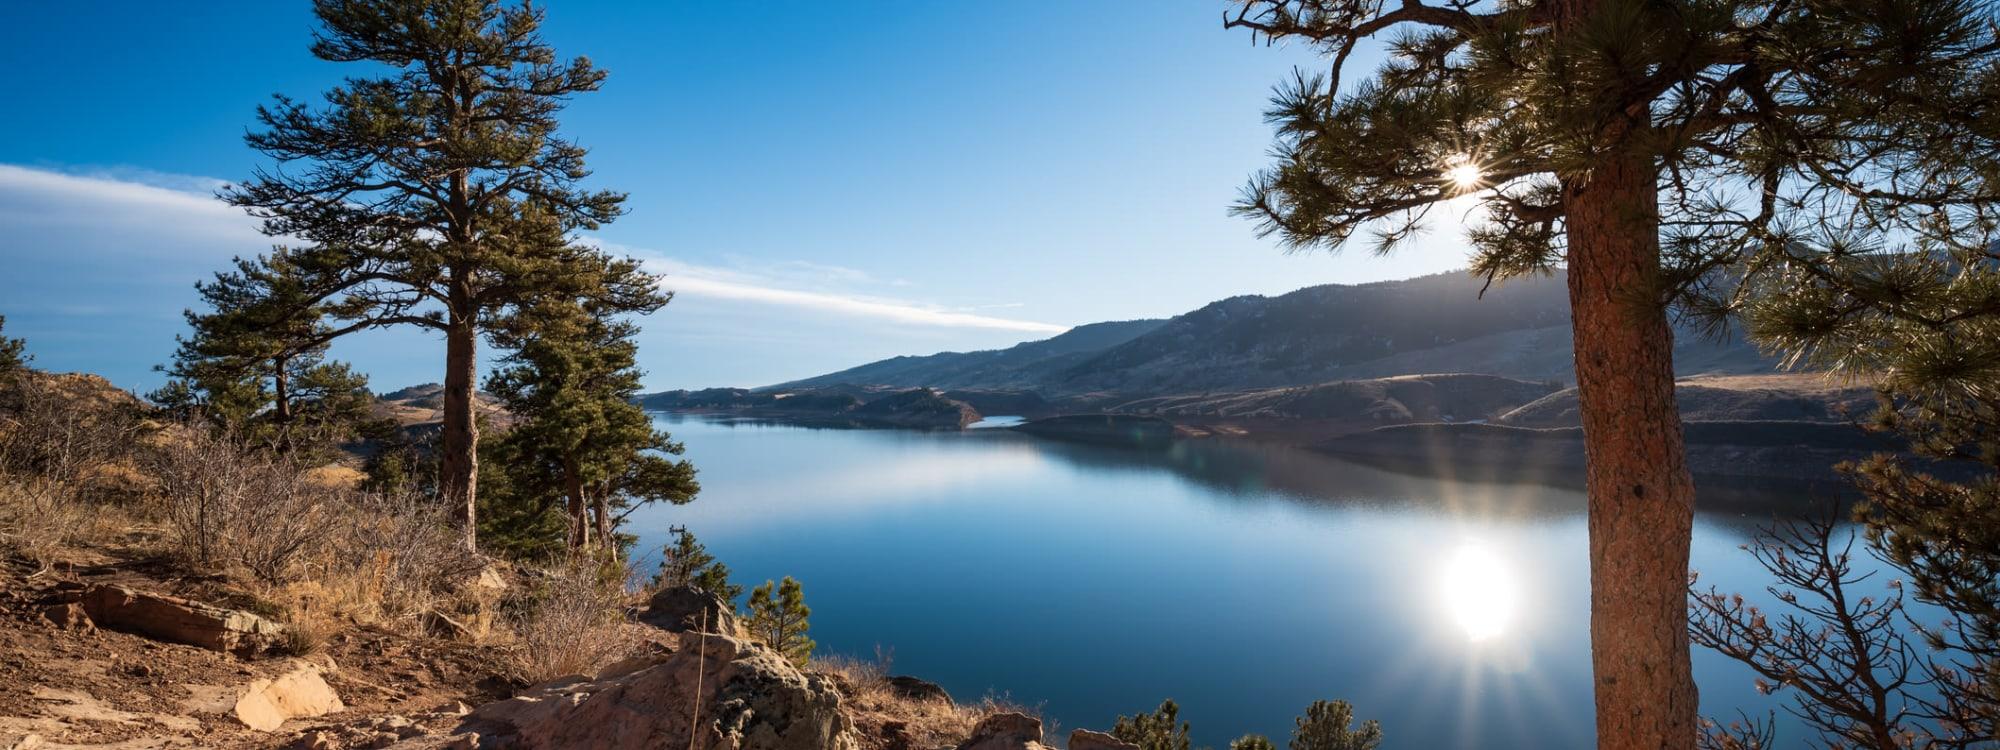 Panoramic view of Horsetooth Reservoir near STOR-N-LOCK Self Storage in Fort Collins, Colorado